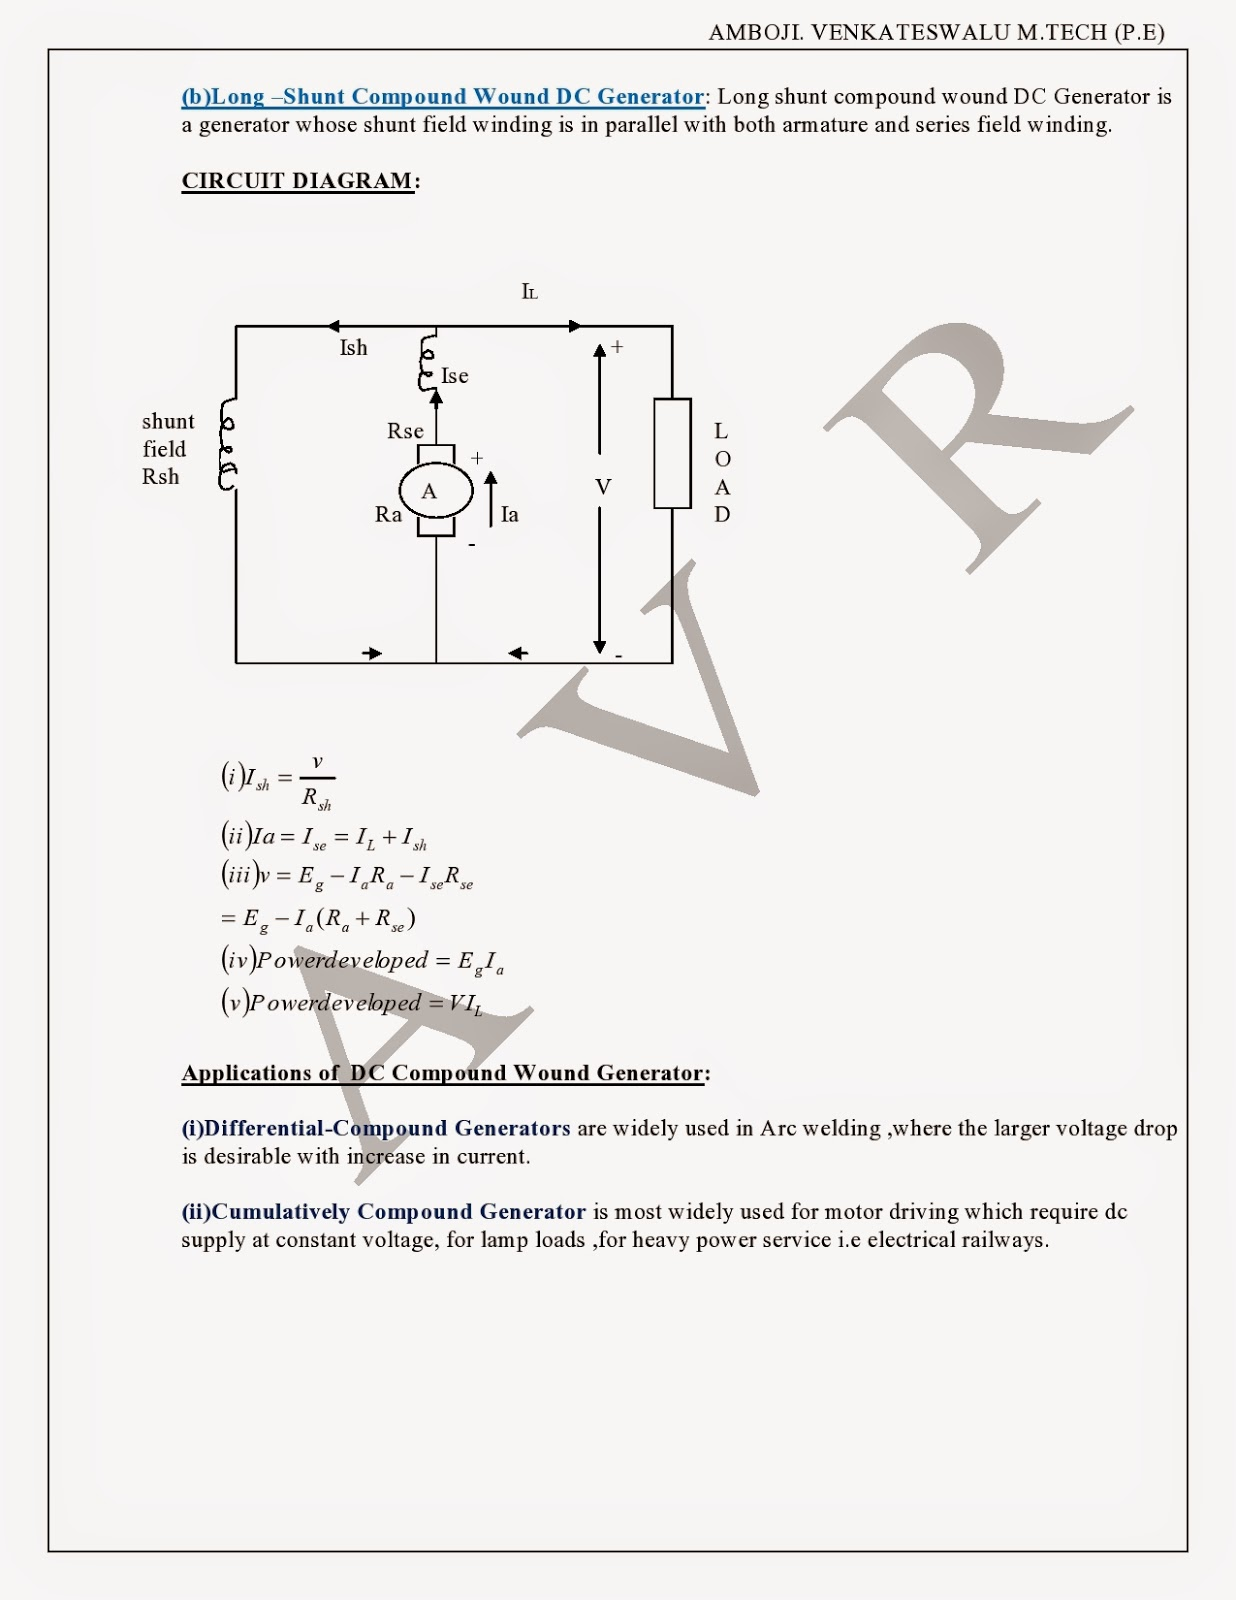 medium resolution of dc generators types of generators emf equation power flow diagram condition for max efficiency applications of dc generators